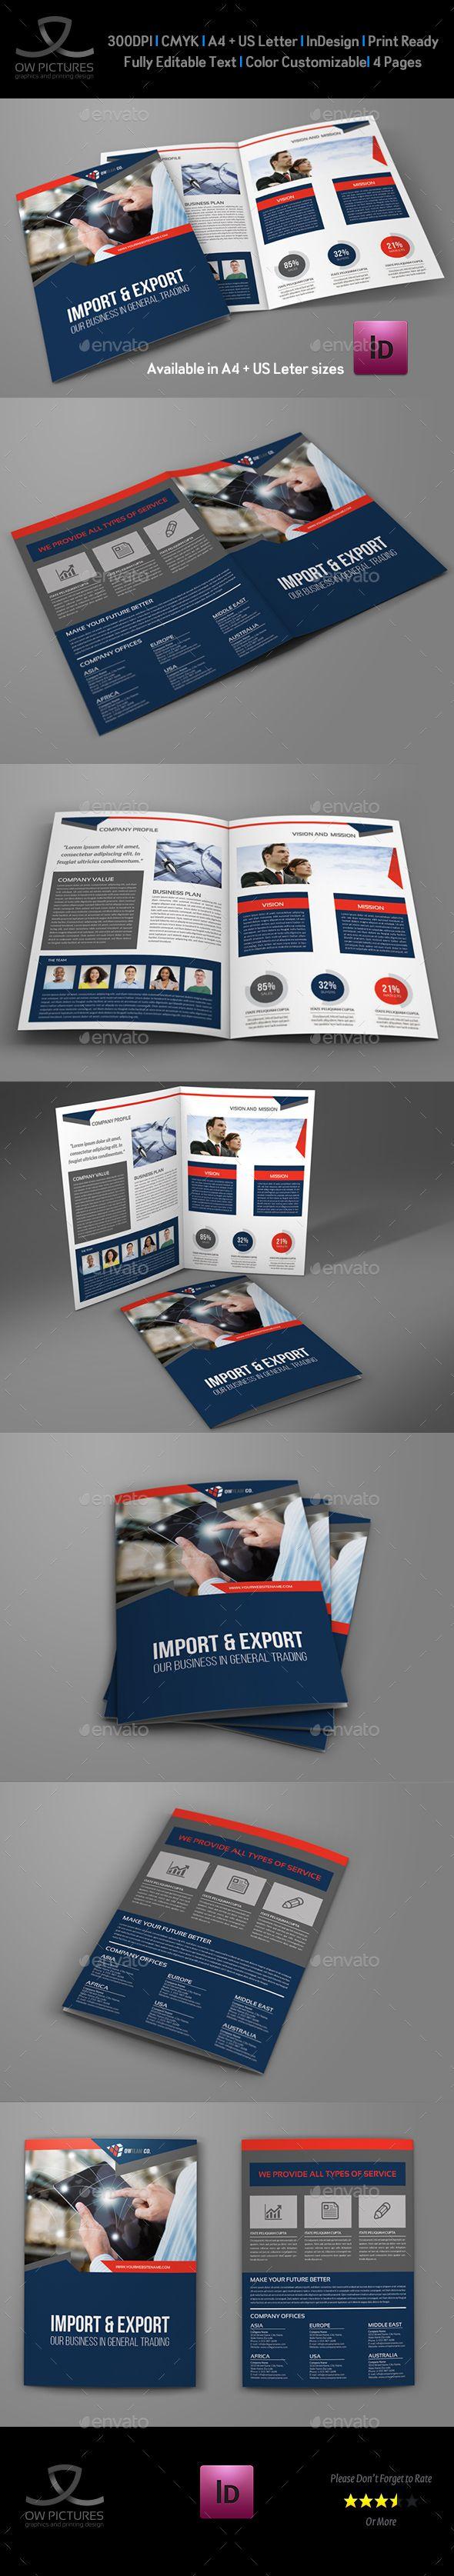 Company Profile Brochure Bi-Fold Template Vol.43 | Plantas